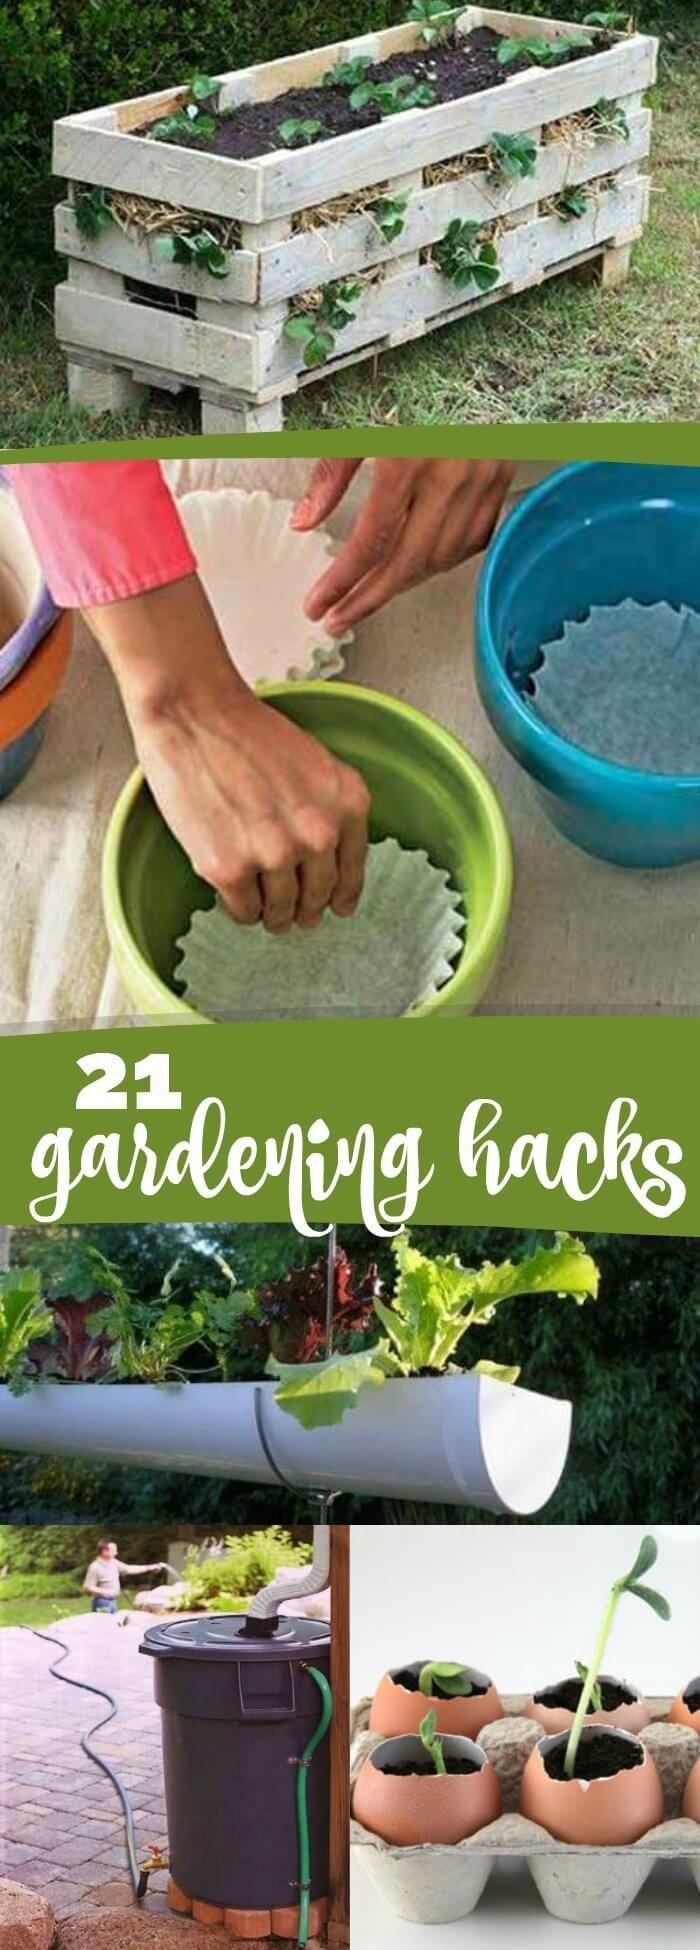 21 Genius Gardening Hacks